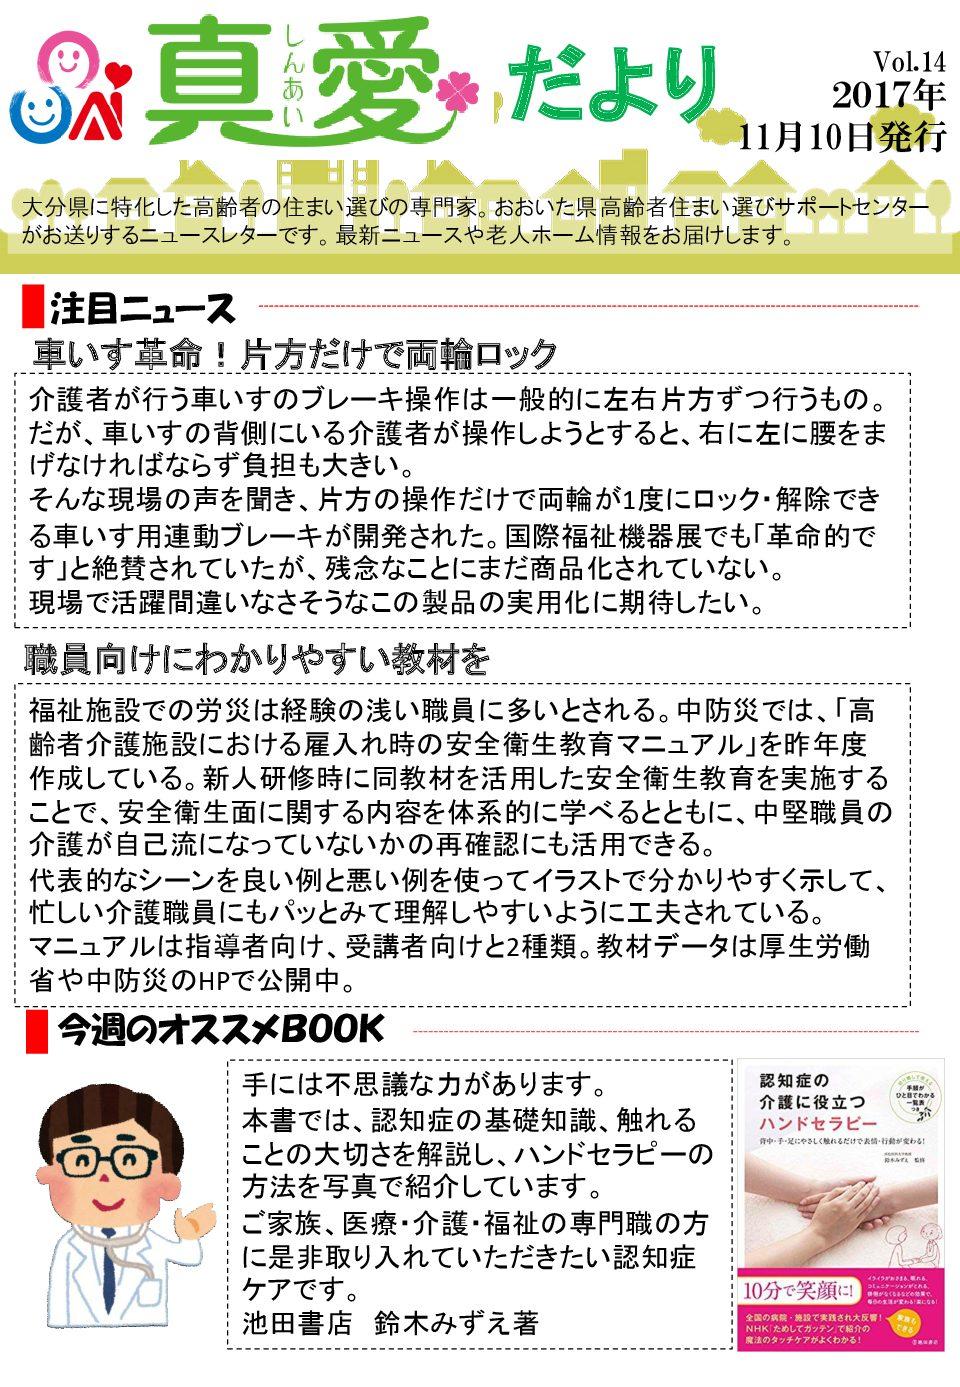 【Vol.14】 2017.11.10発行